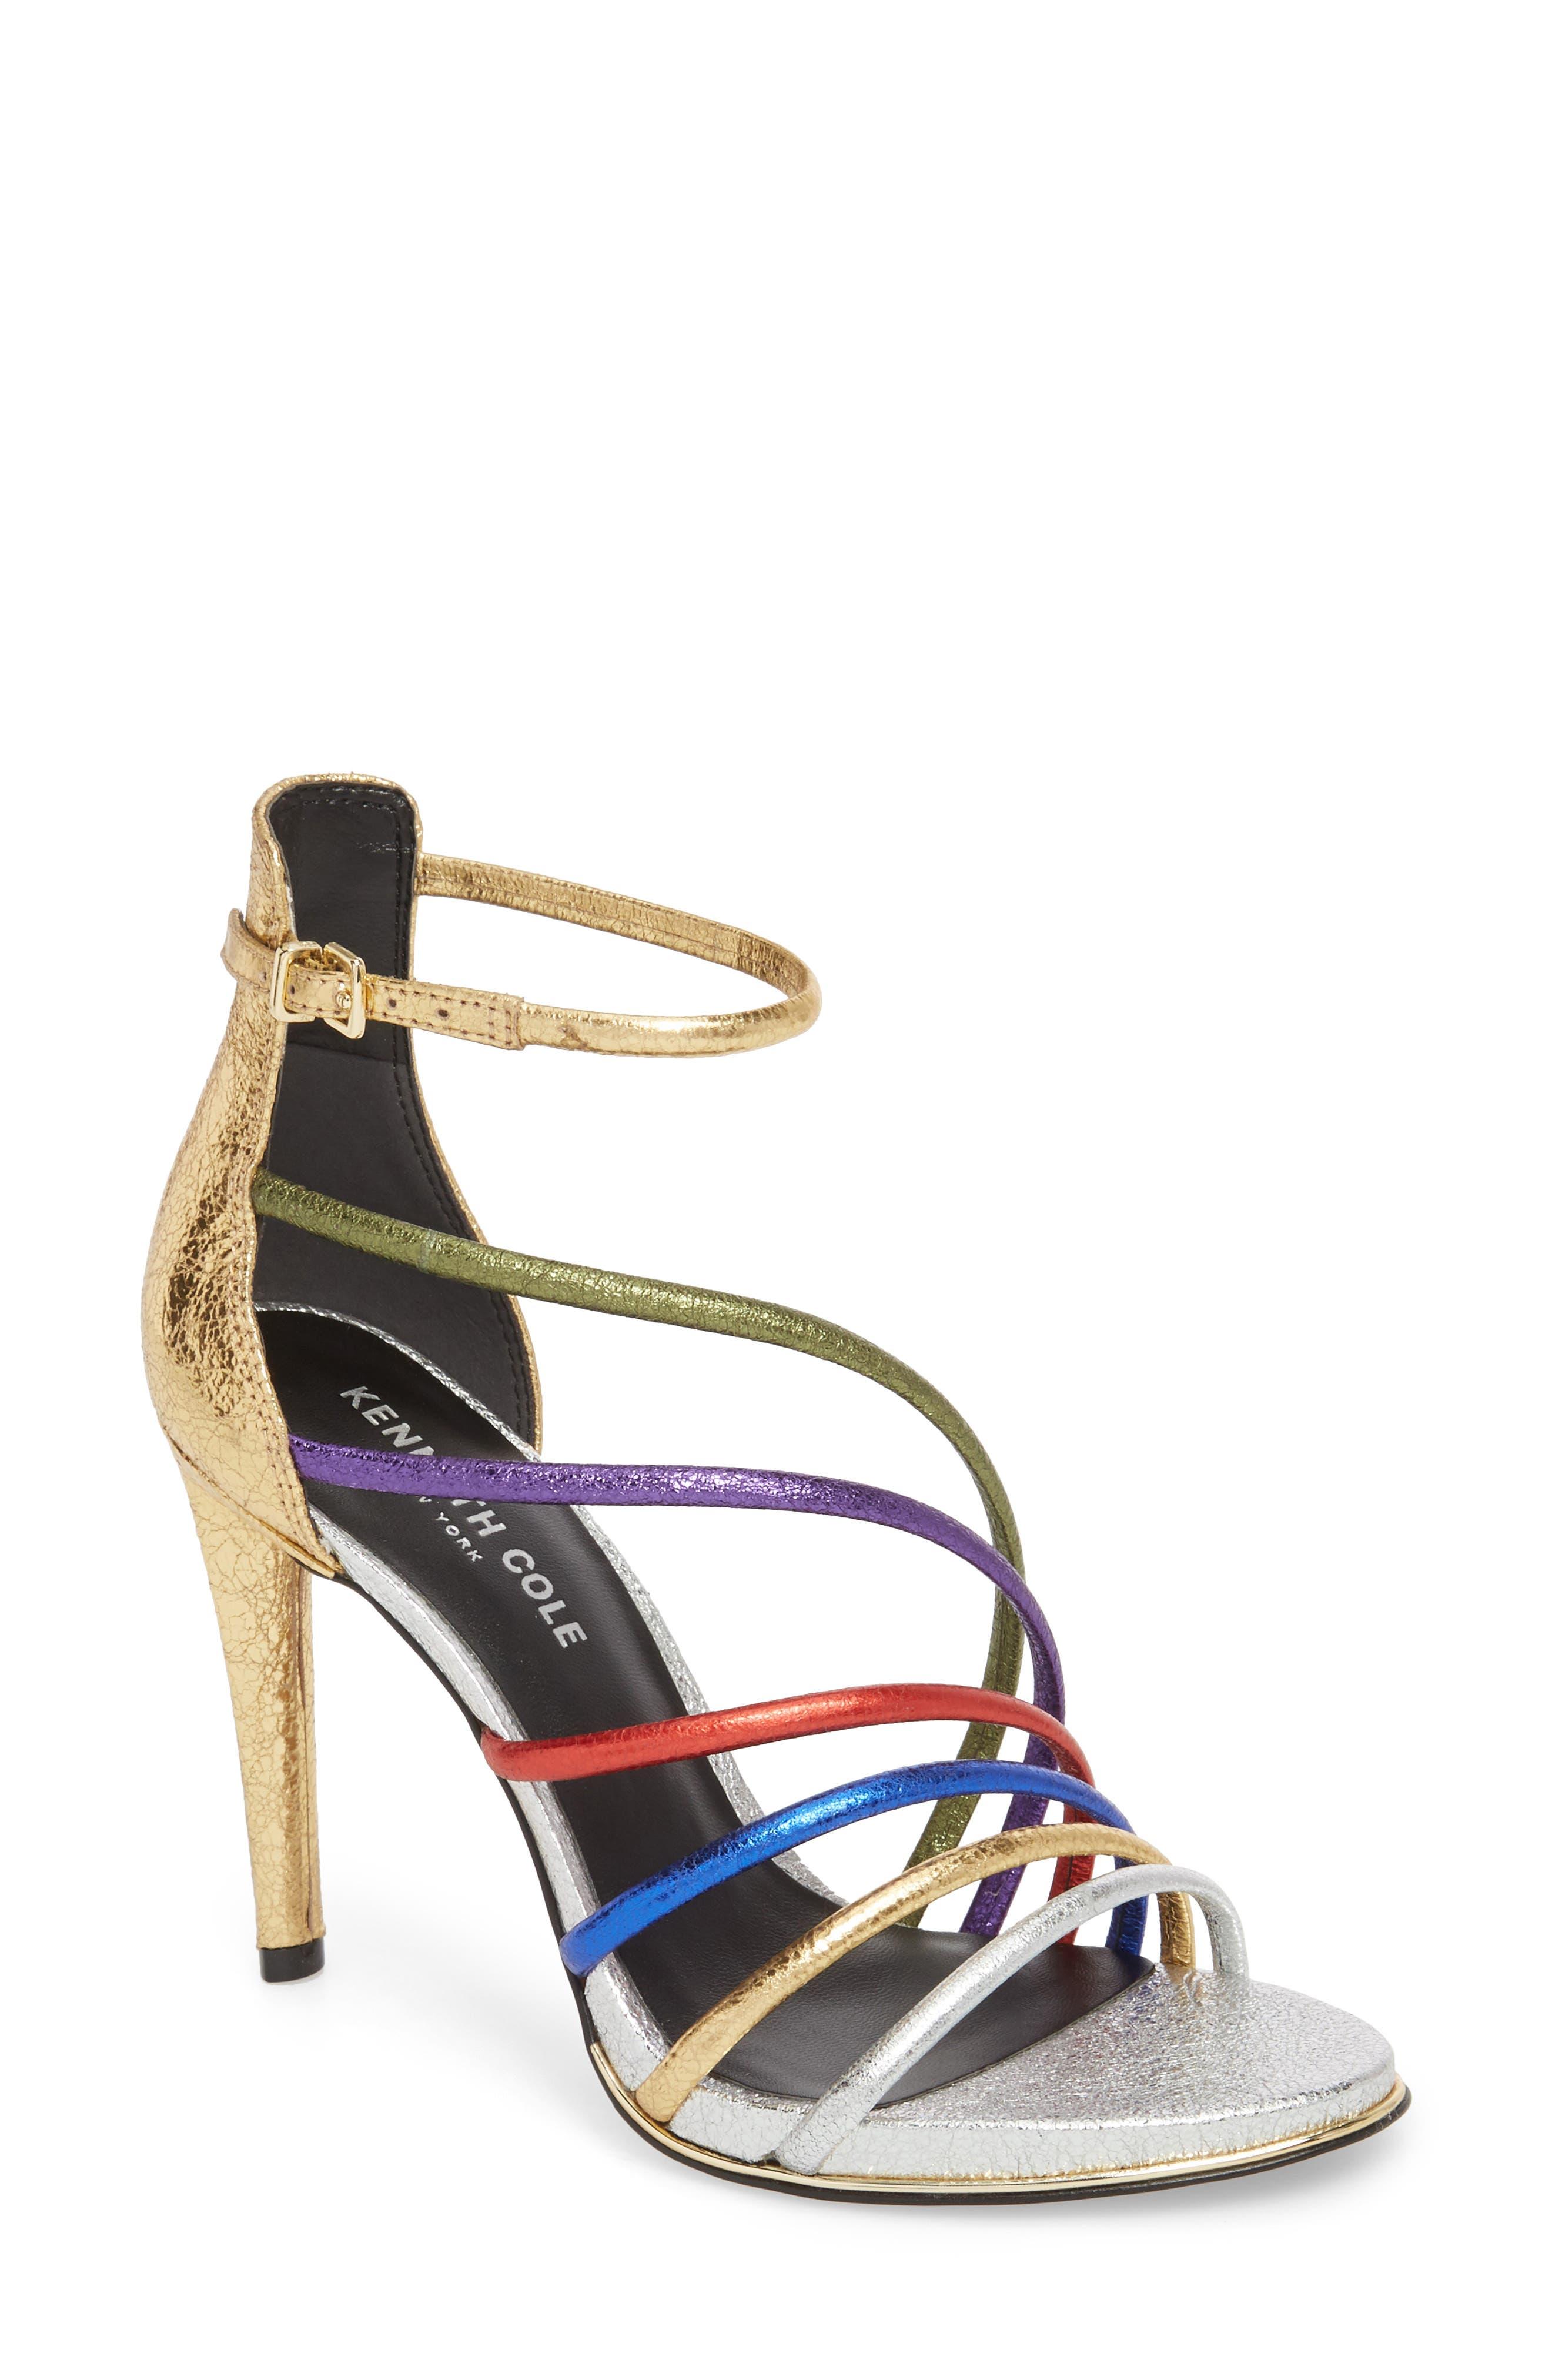 Barletta Asymmetrical Strappy Sandal,                             Main thumbnail 1, color,                             MULTI LEATHER